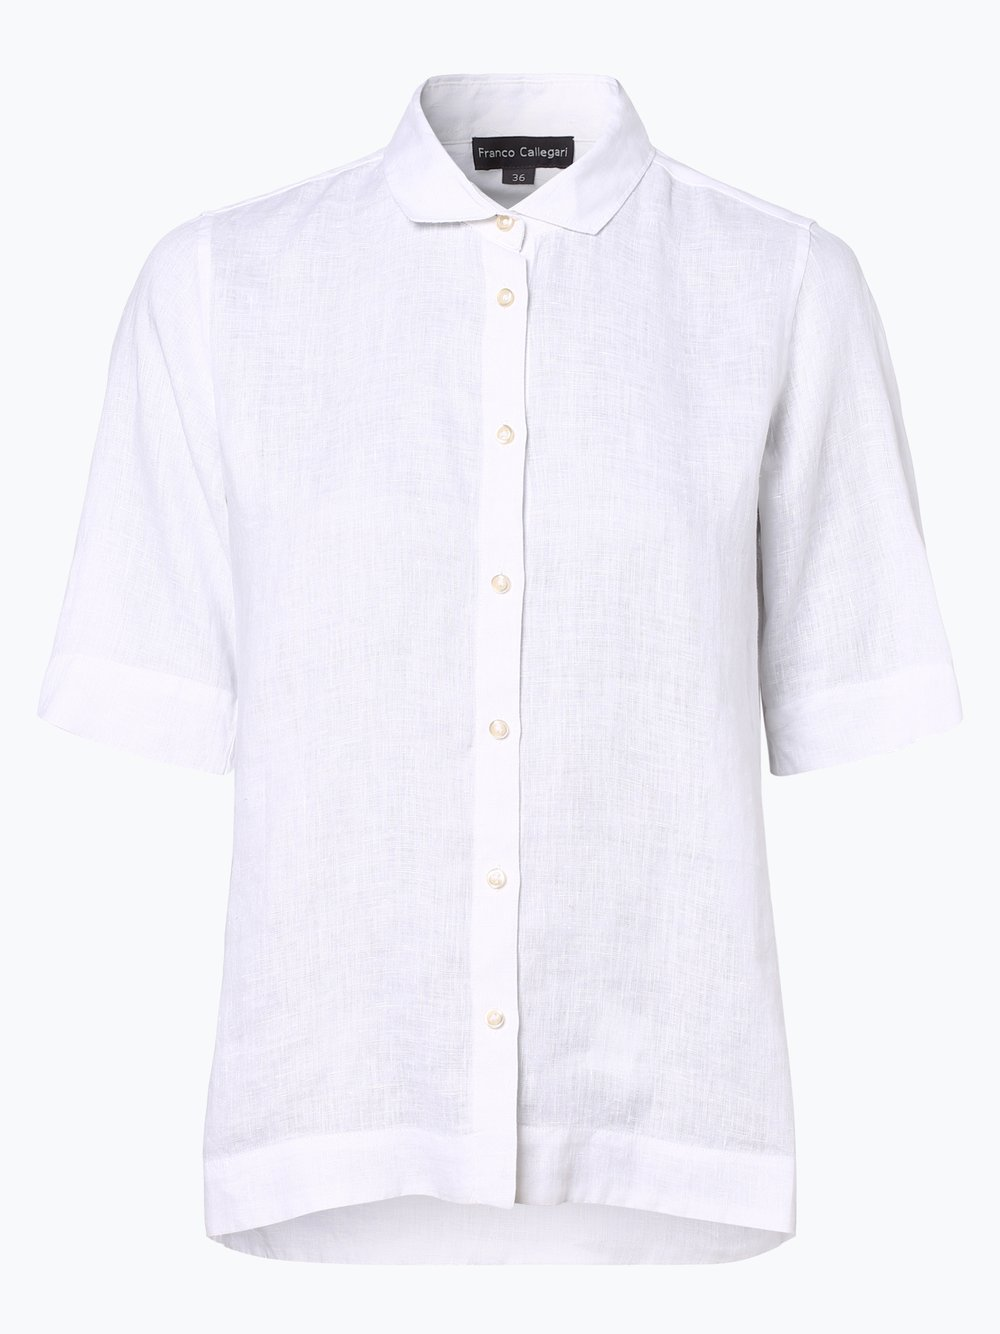 Franco Callegari - Damska bluzka lniana, biały